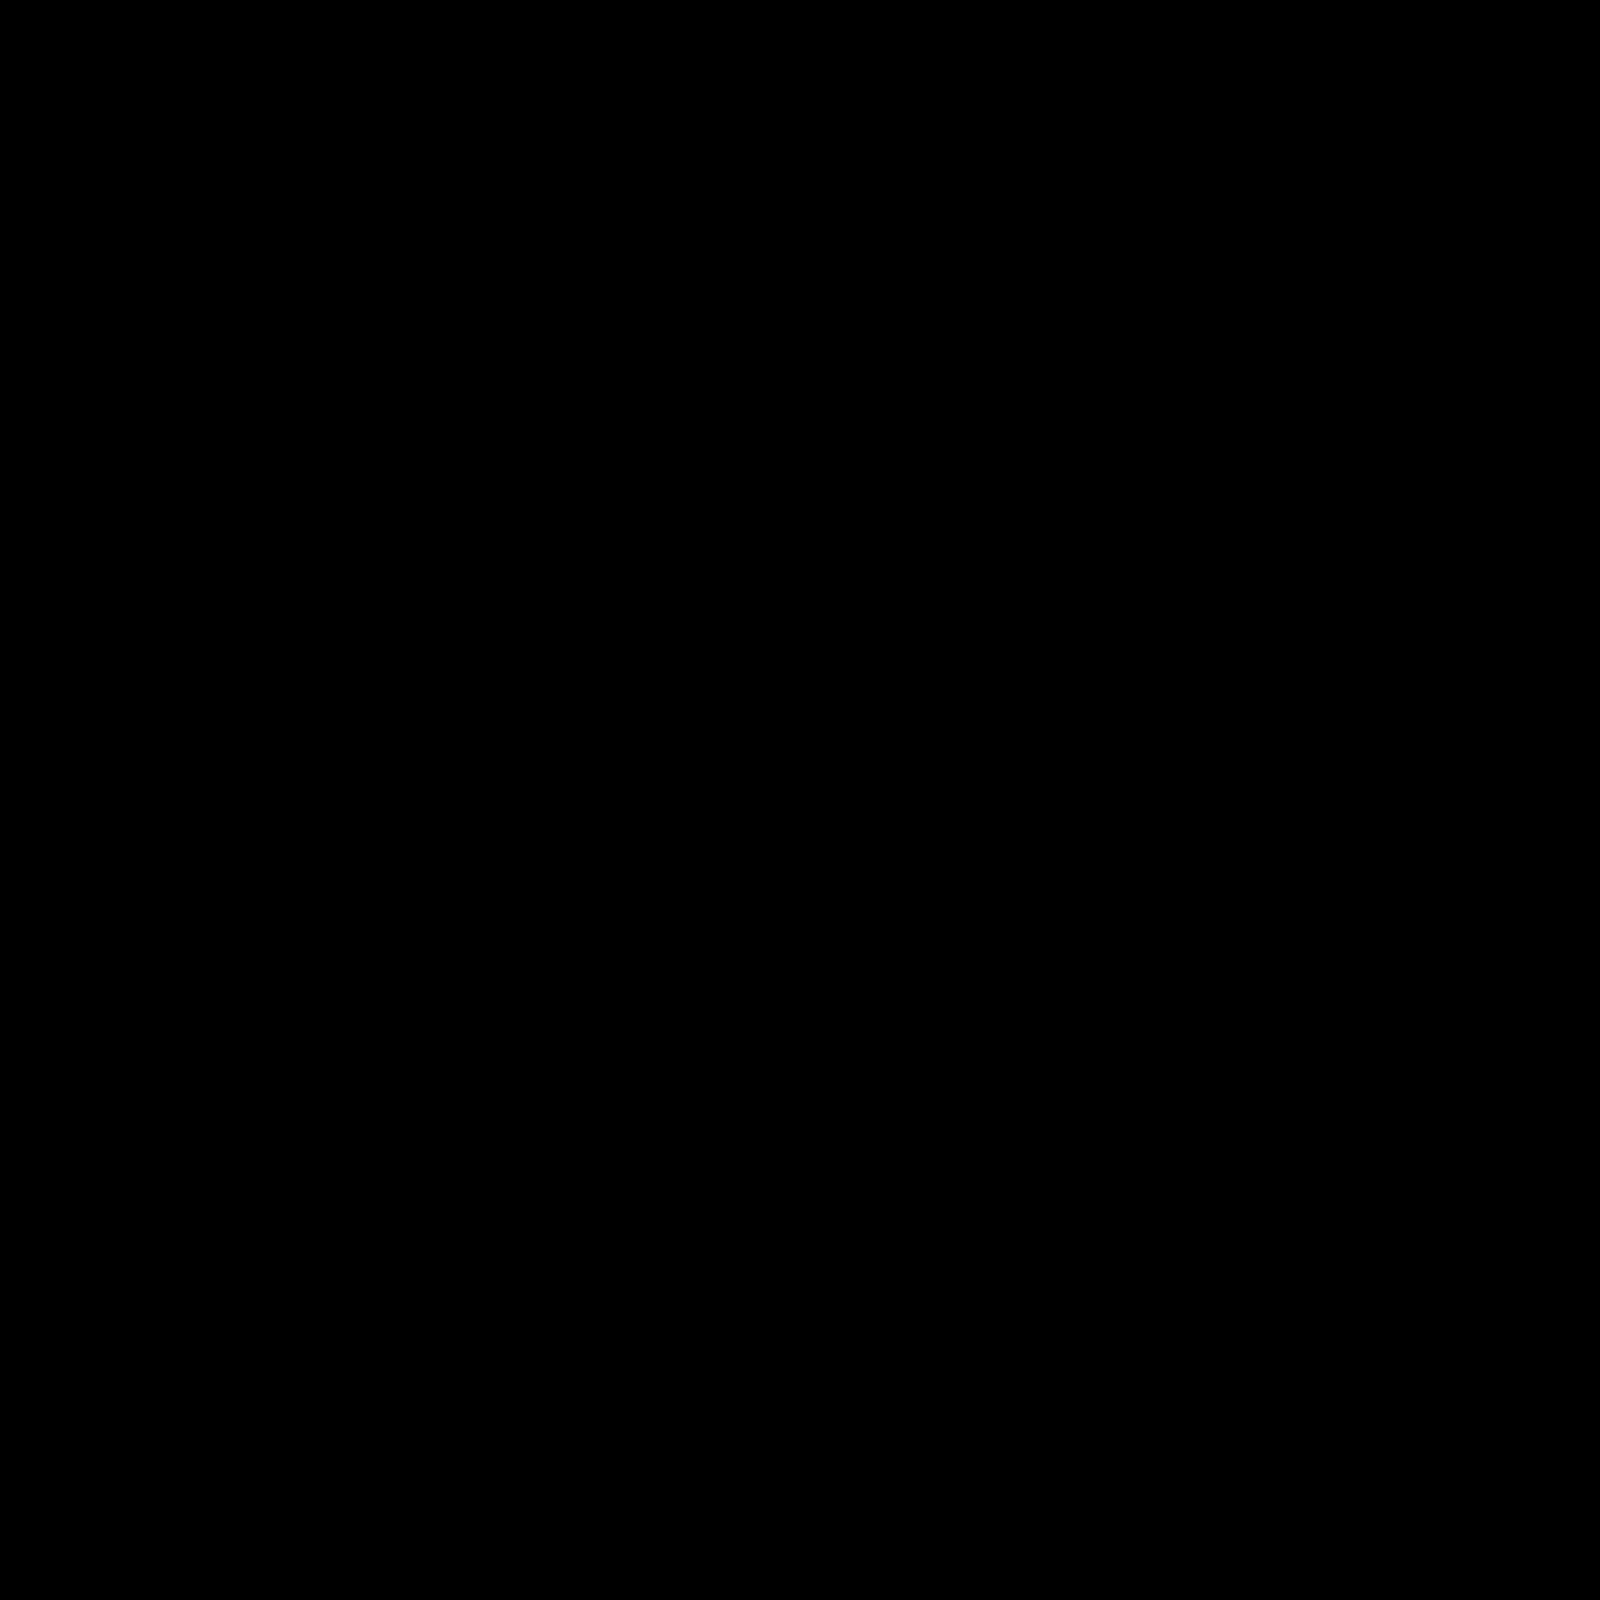 Erase Image icon